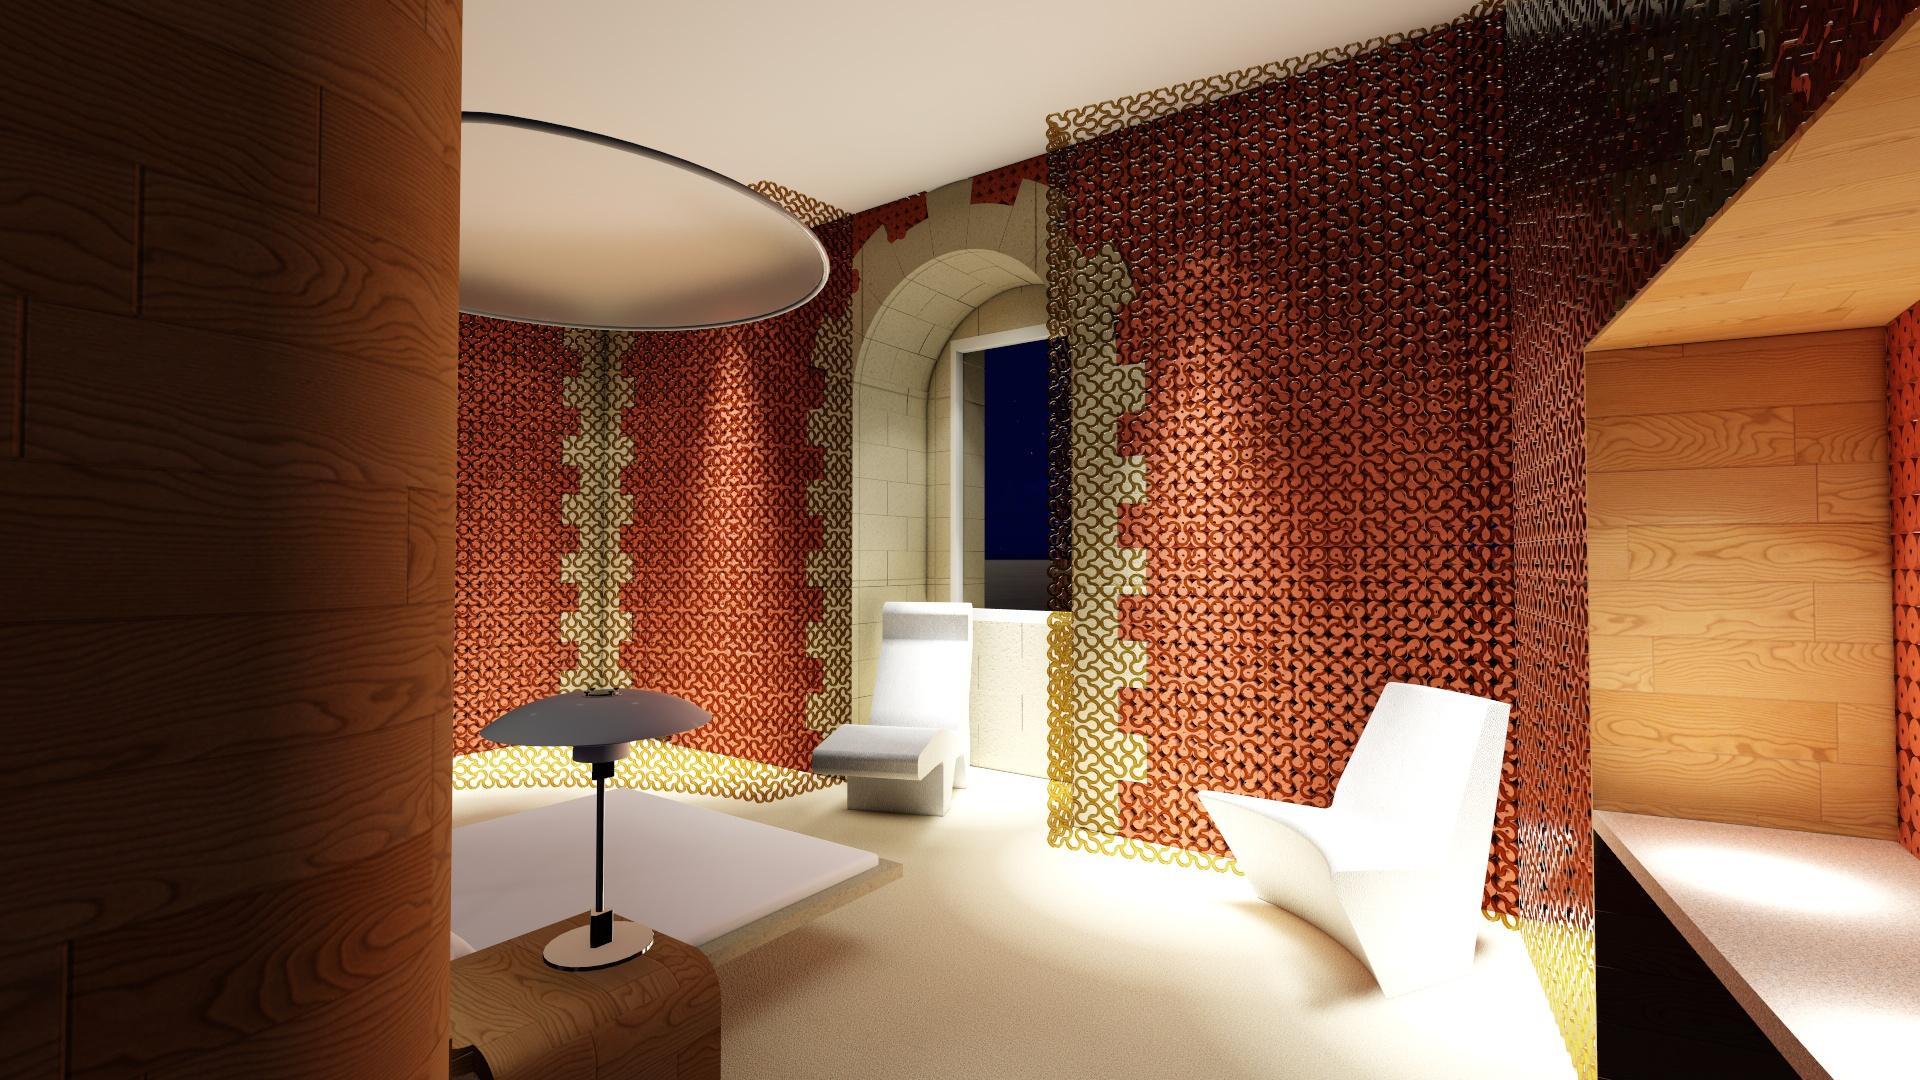 Hotel Telesio - Trani, Italy